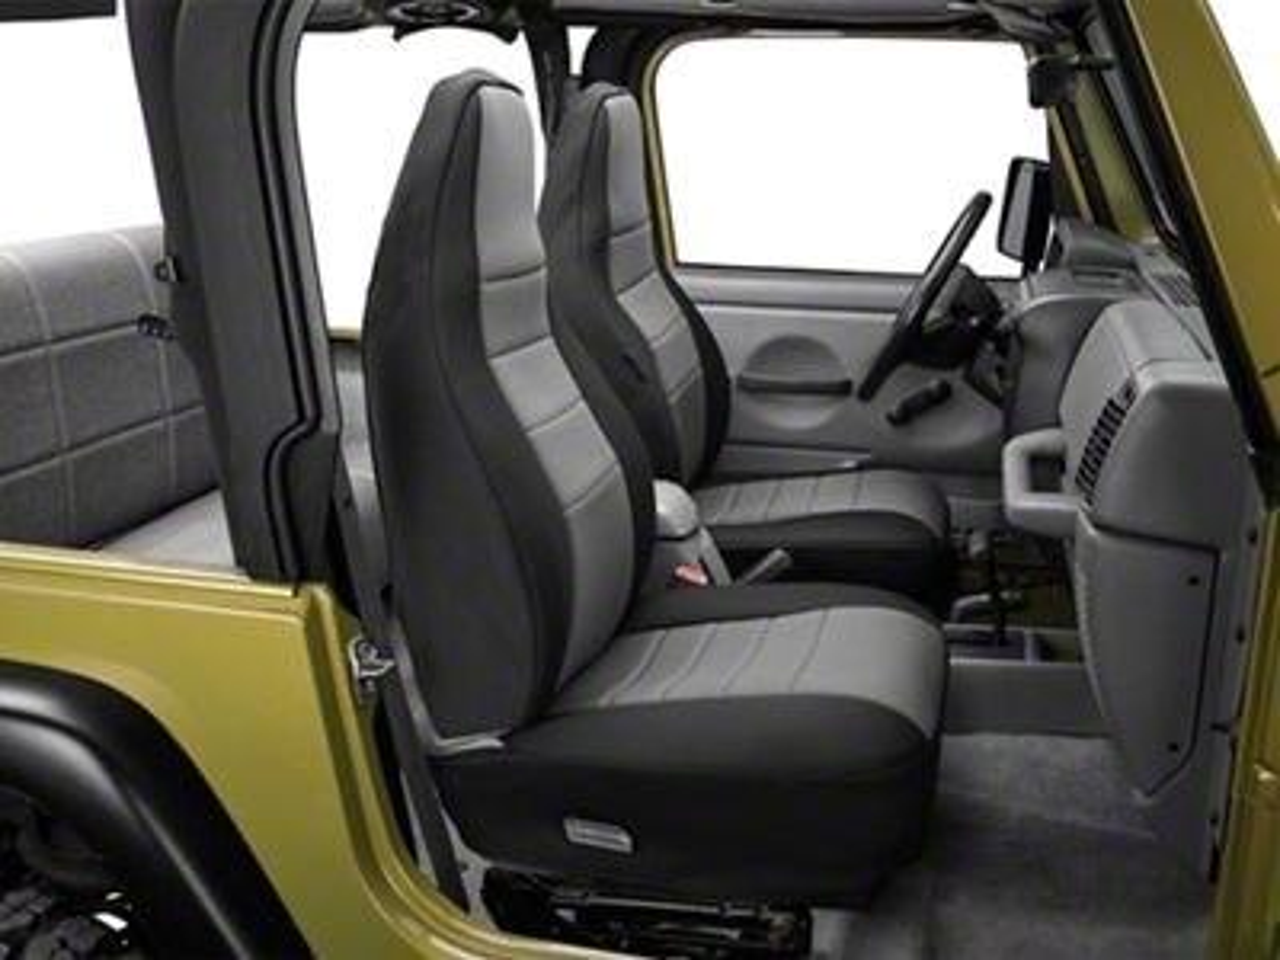 Rugged Ridge Neoprene Front Seat Covers - Gray (97-02 Jeep Wrangler TJ)